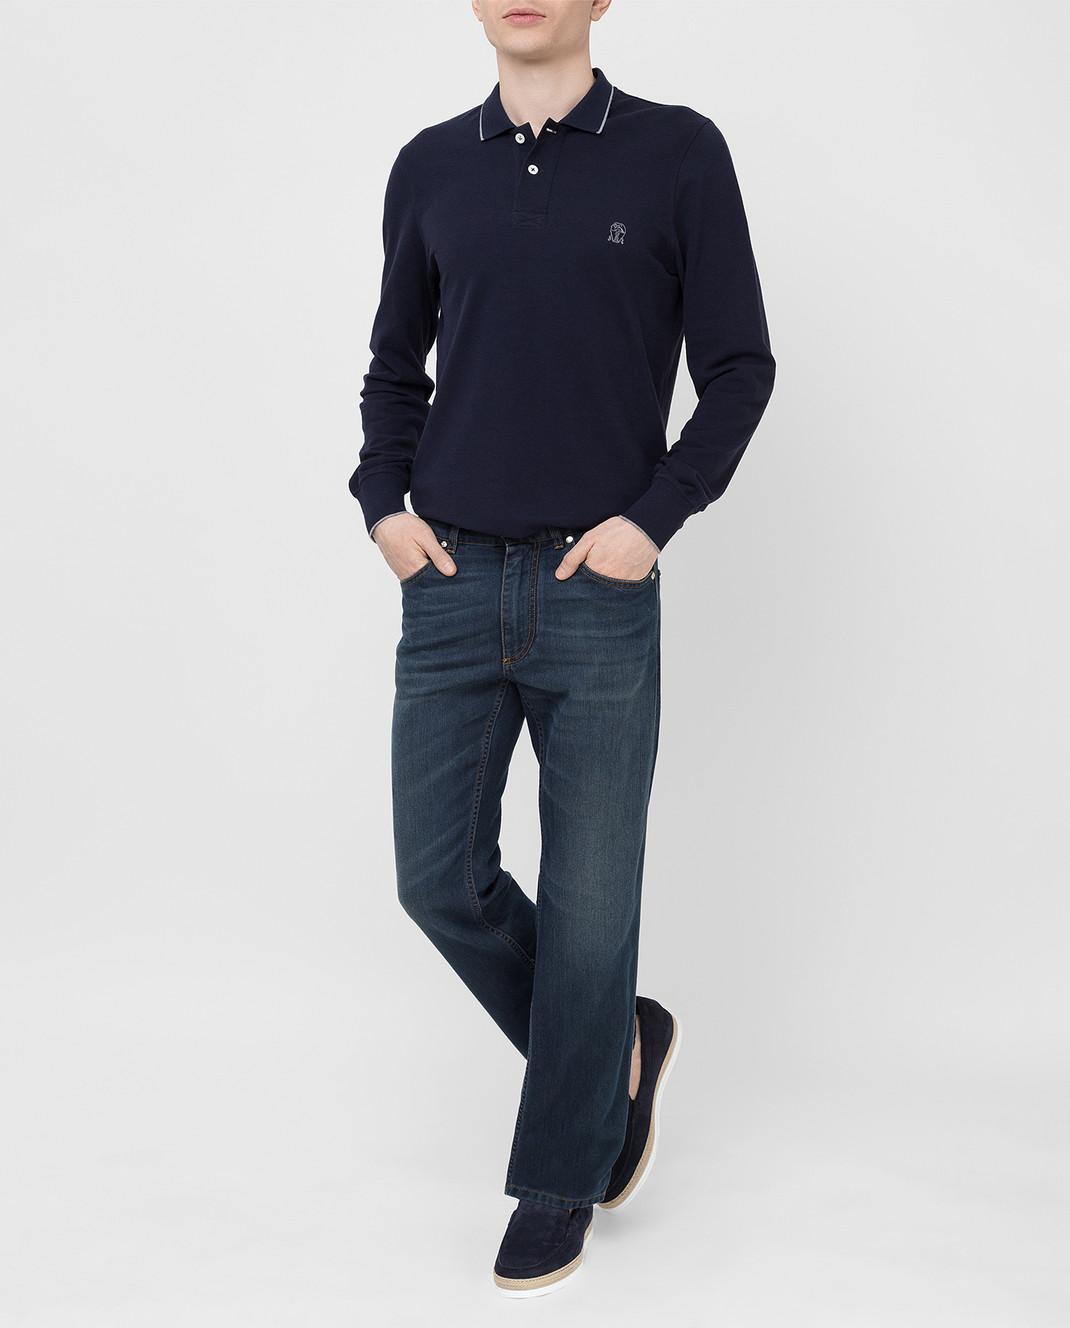 Ferutdin Zakirov Темно-синие джинсы FZA4900JN4000 изображение 2